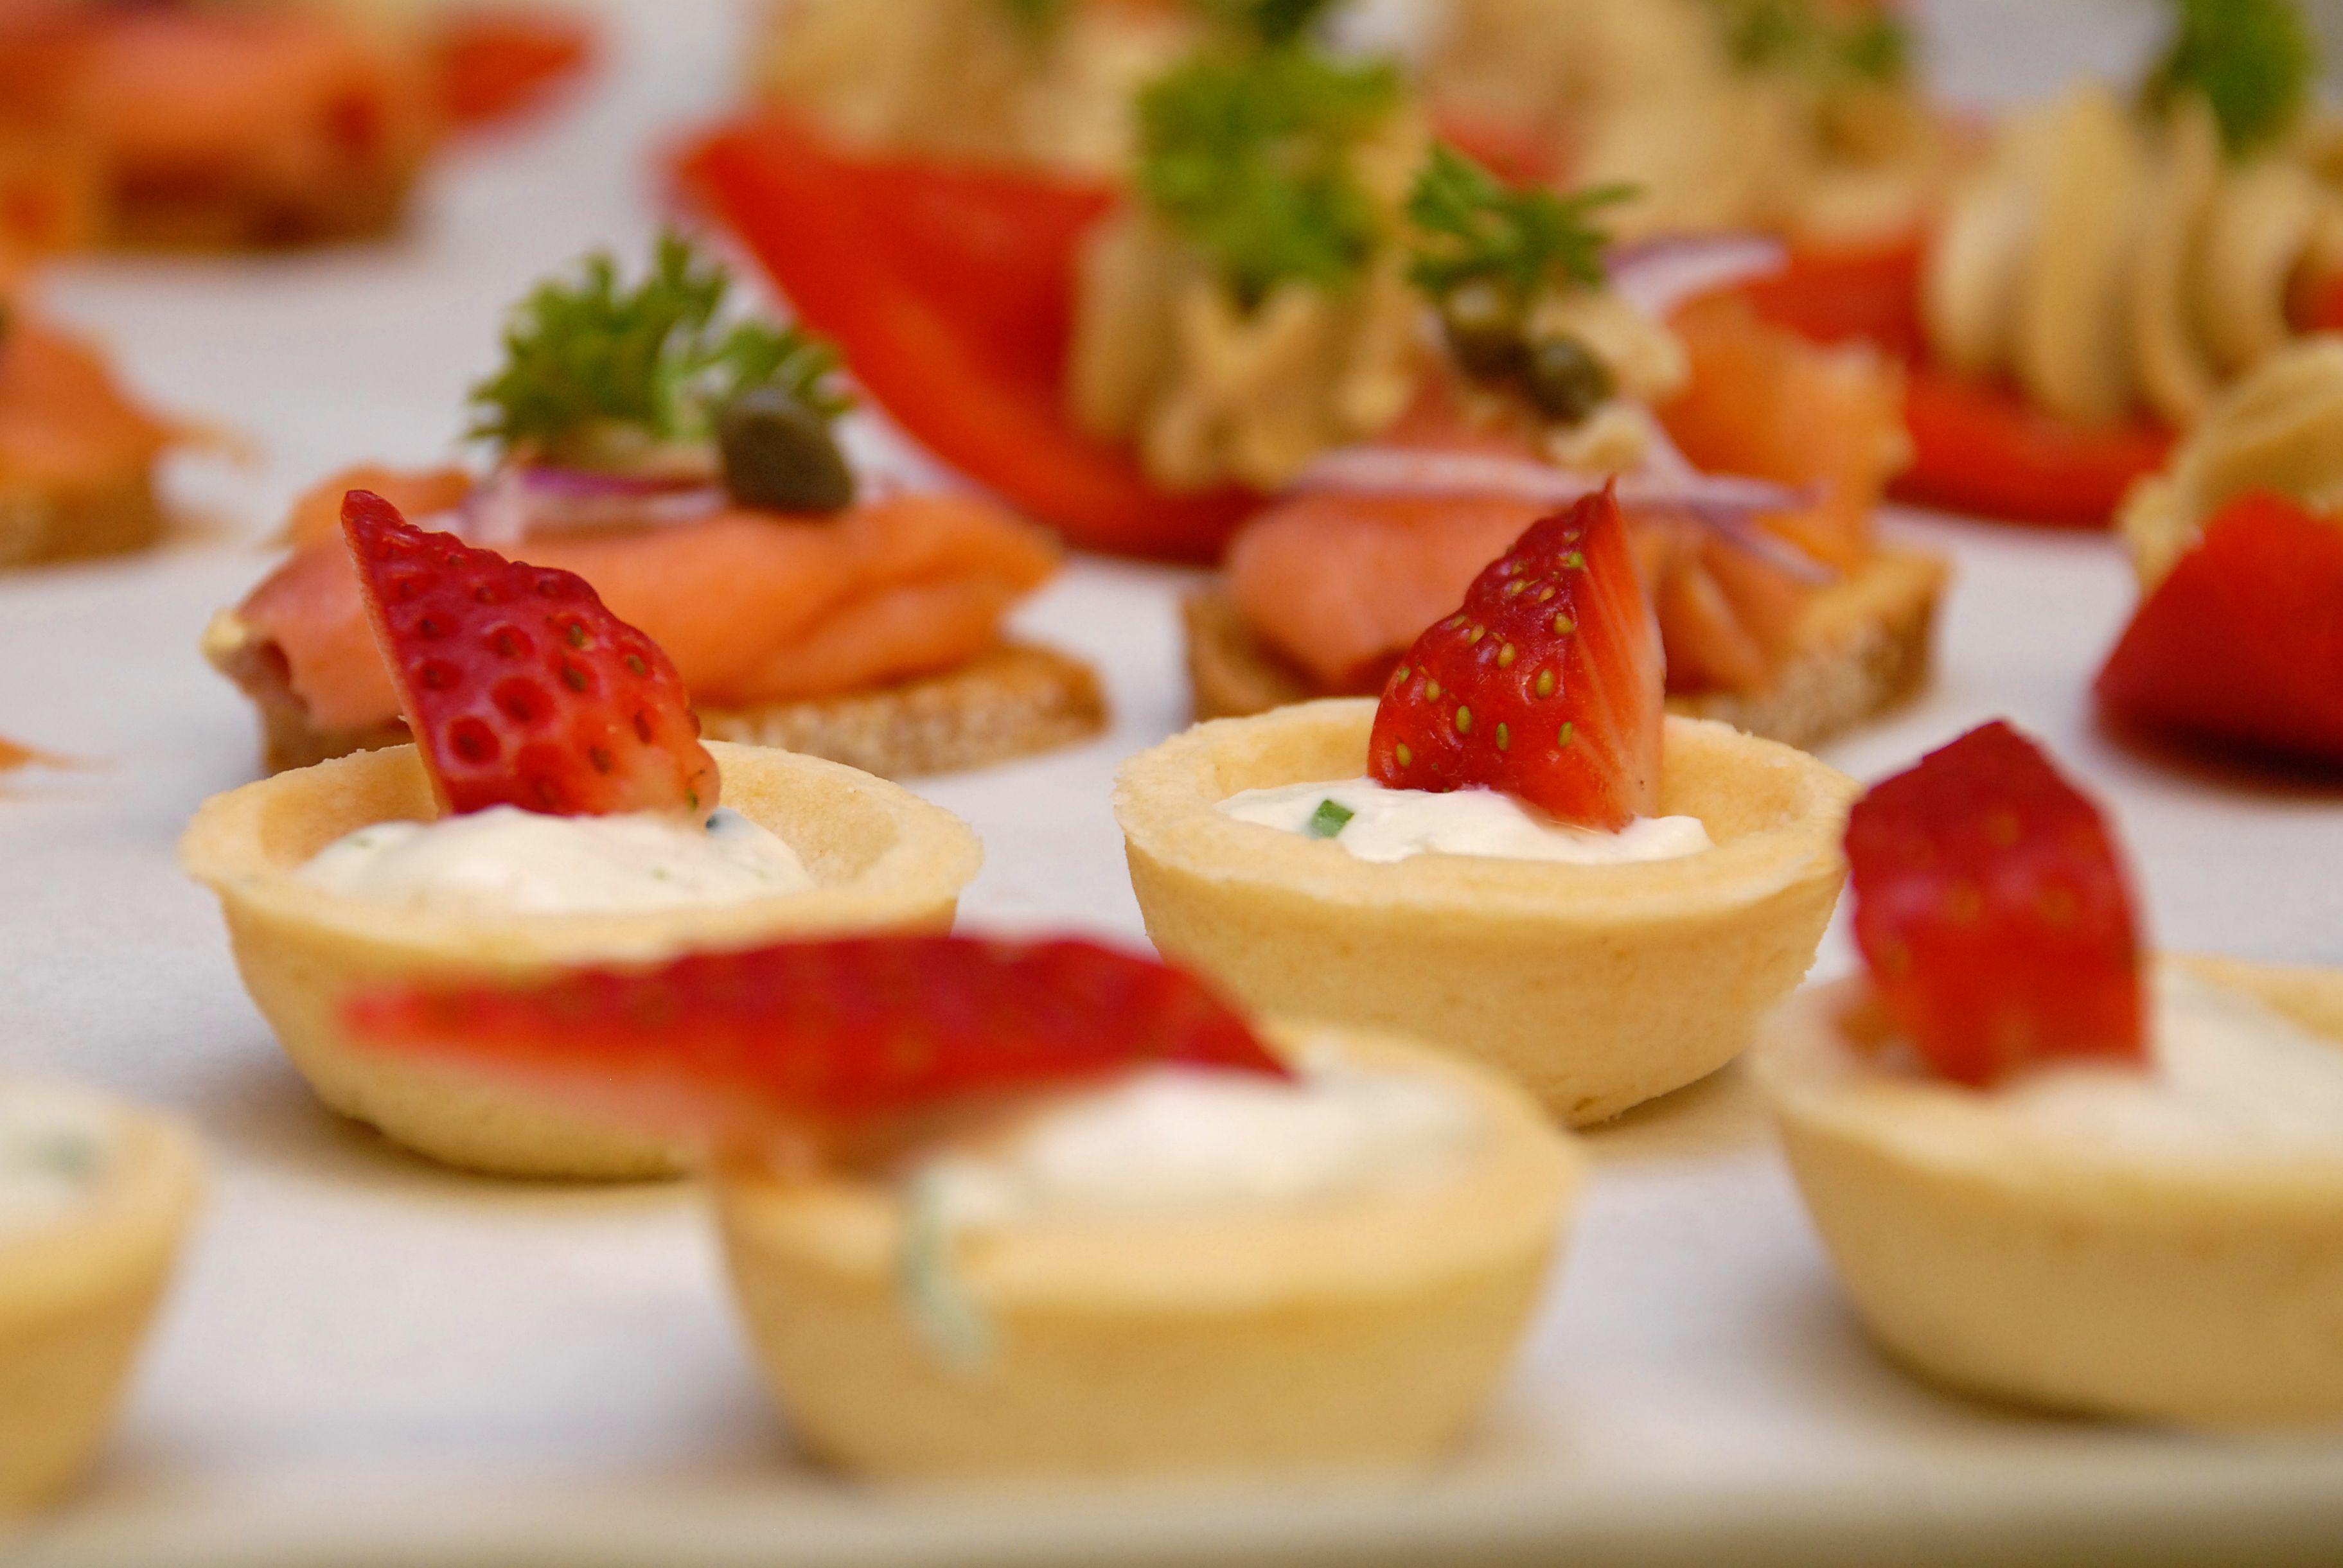 Executive chef prepares meal for Gourmet Club Austrian